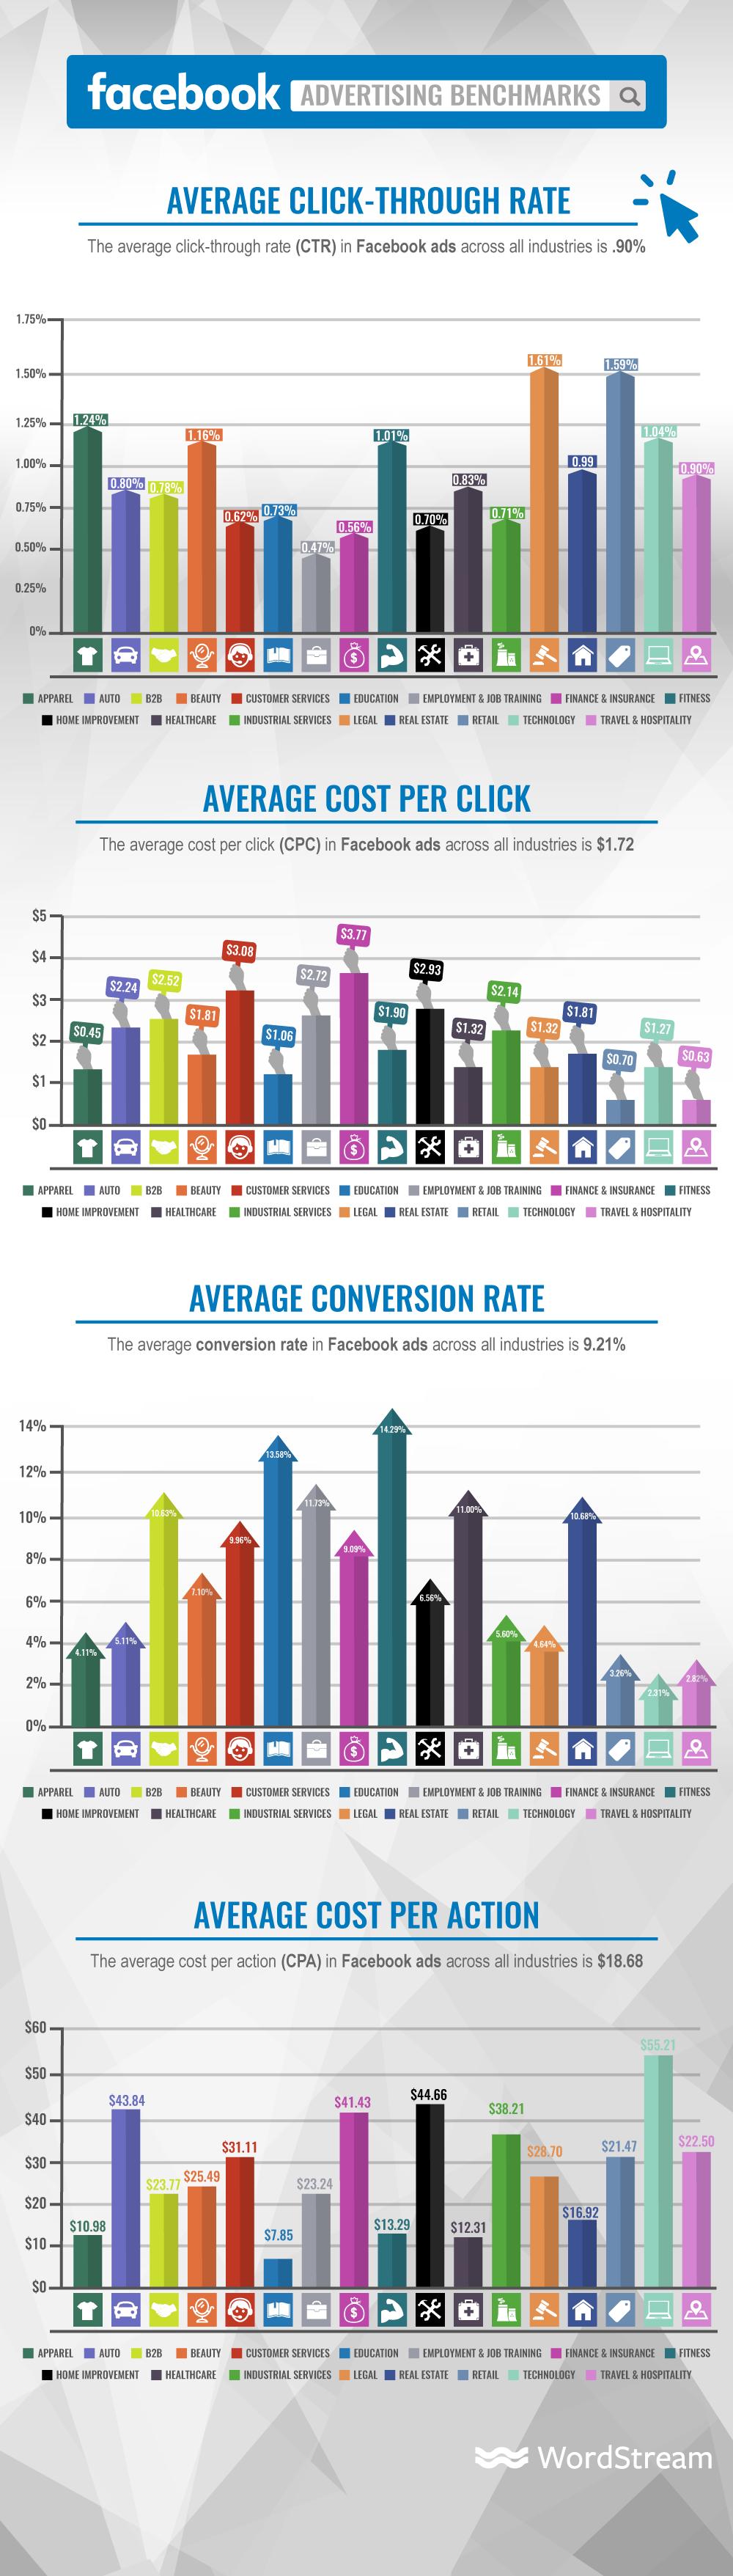 Facebook advertising benchmark